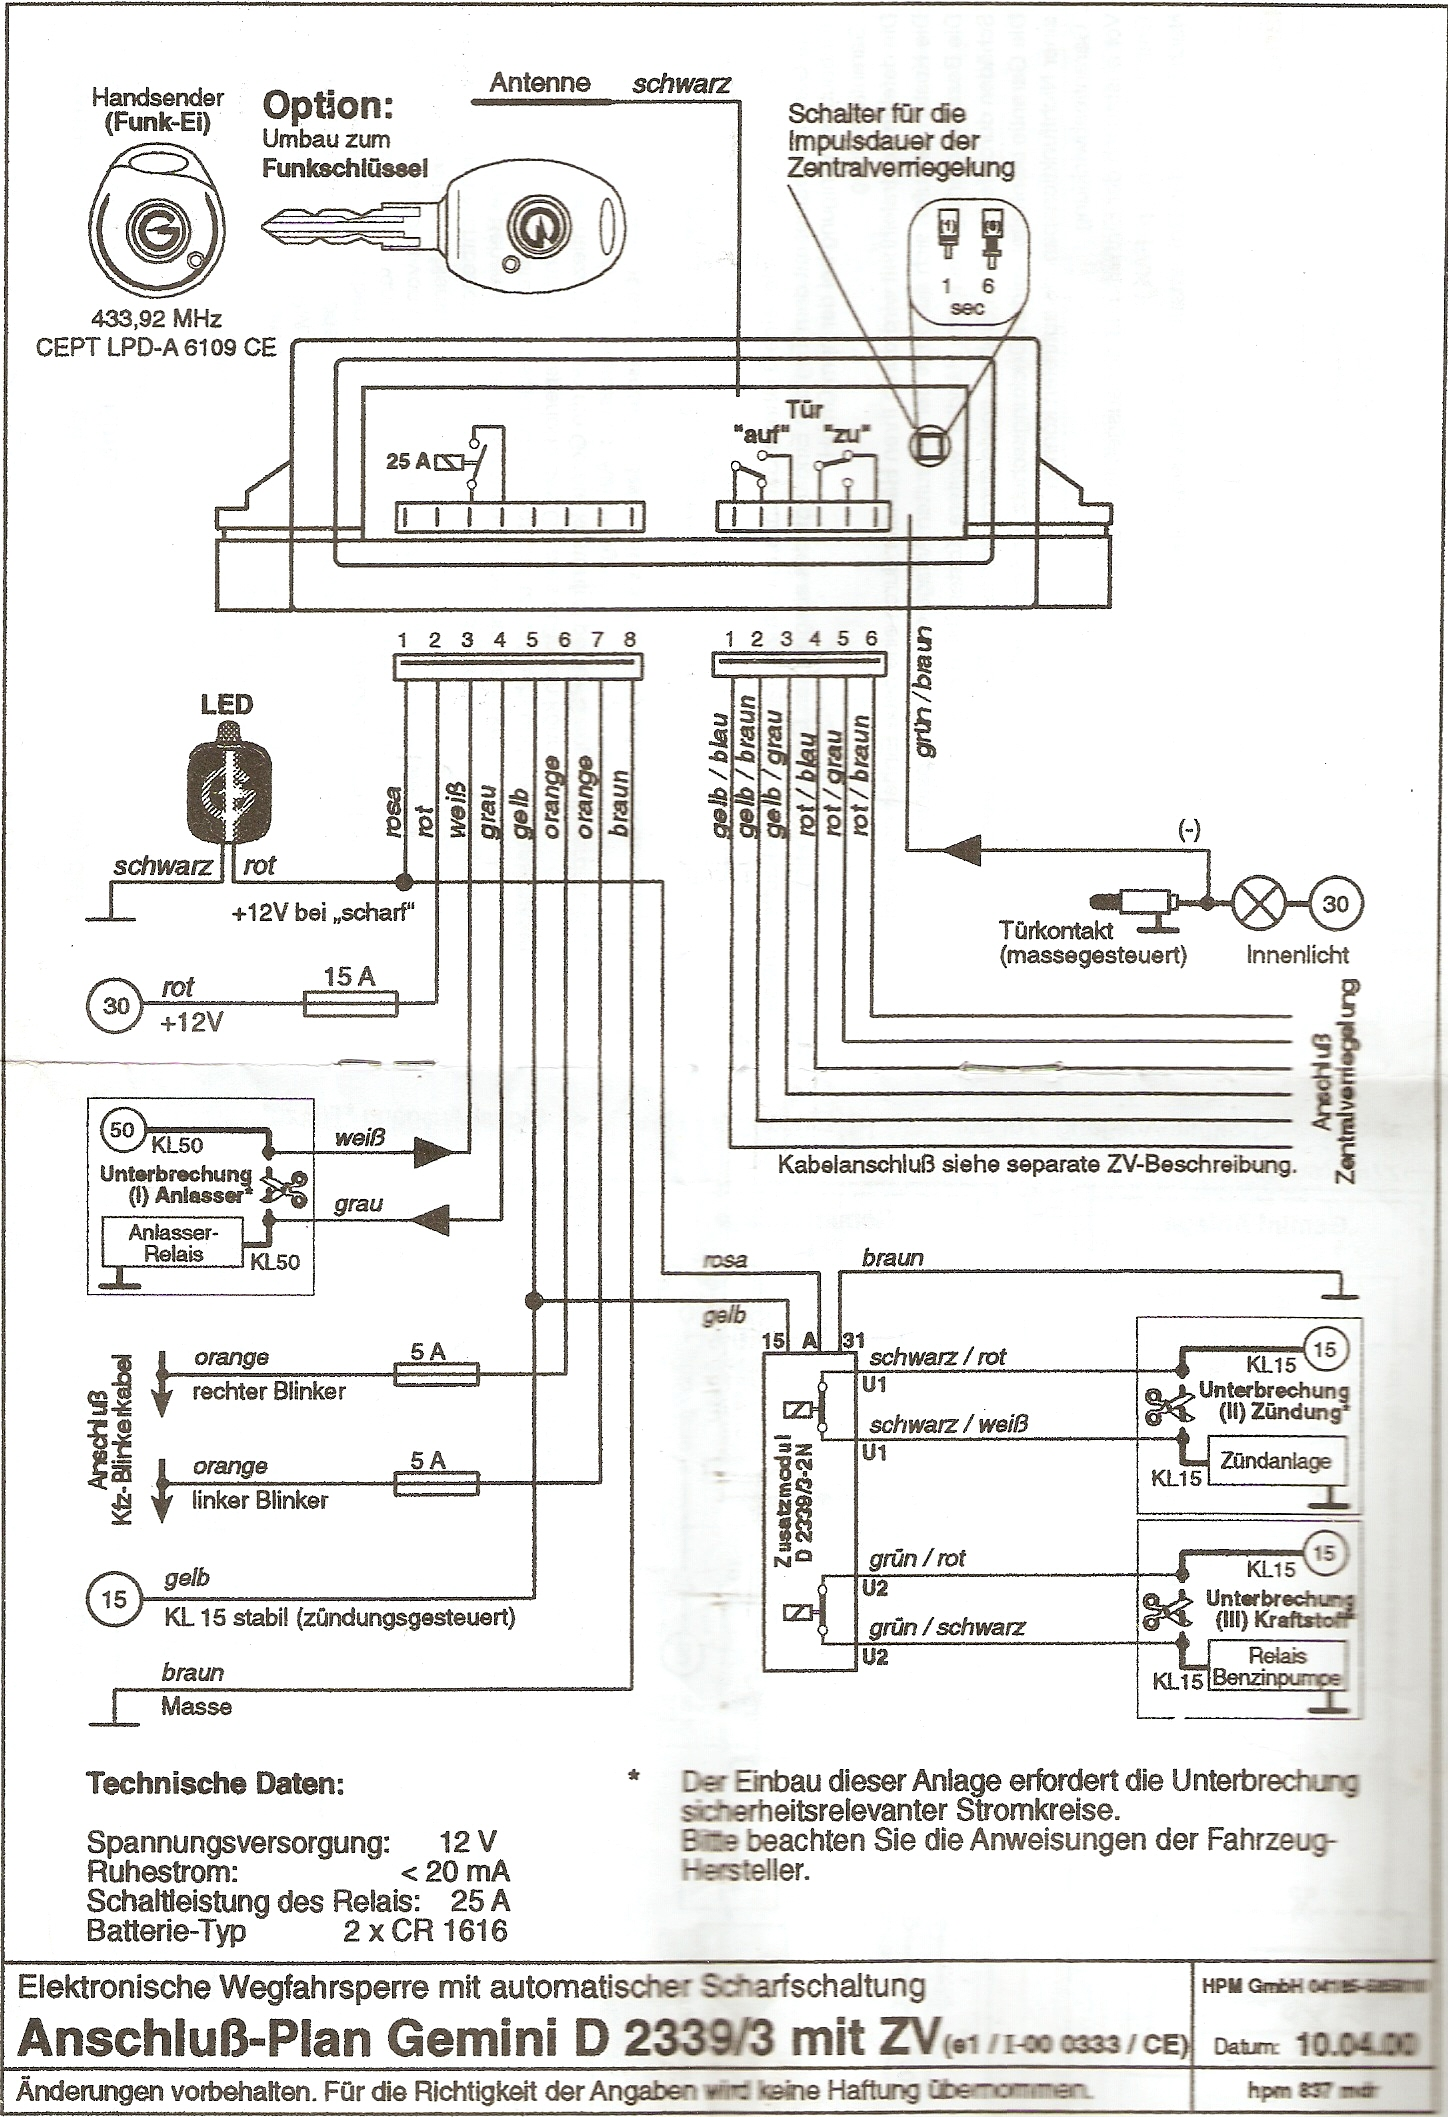 commando alarms wiring diagrams building plans and design bcg, Wiring diagram